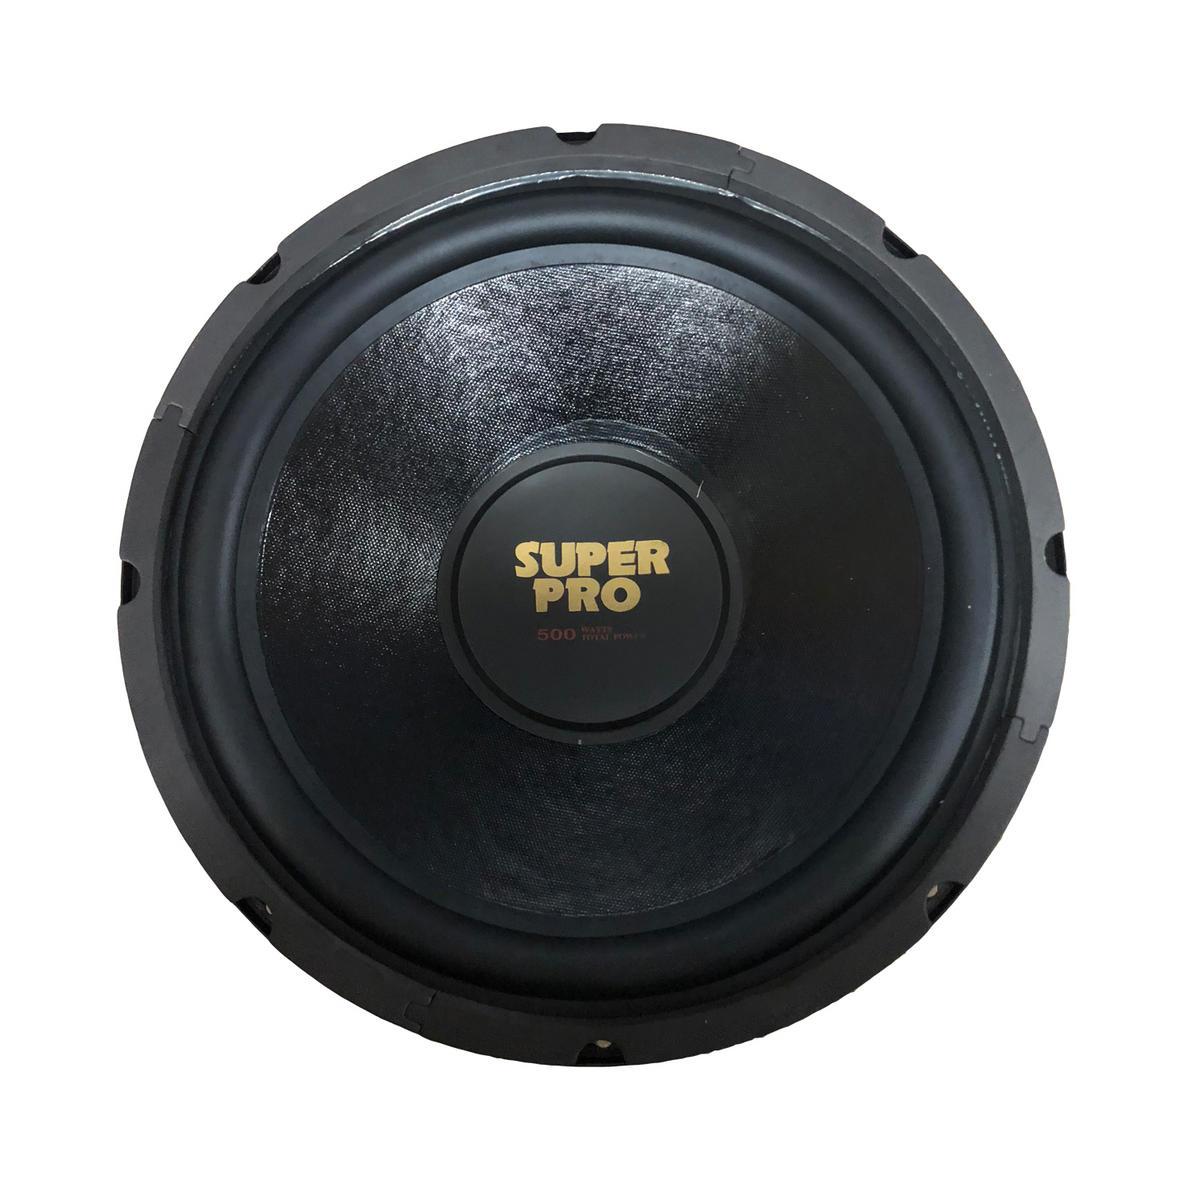 "Pyramid Pro 8 Ohm 12"" 500w Car Audio Subwoofer Driver Sub Bass Speaker Woofer"